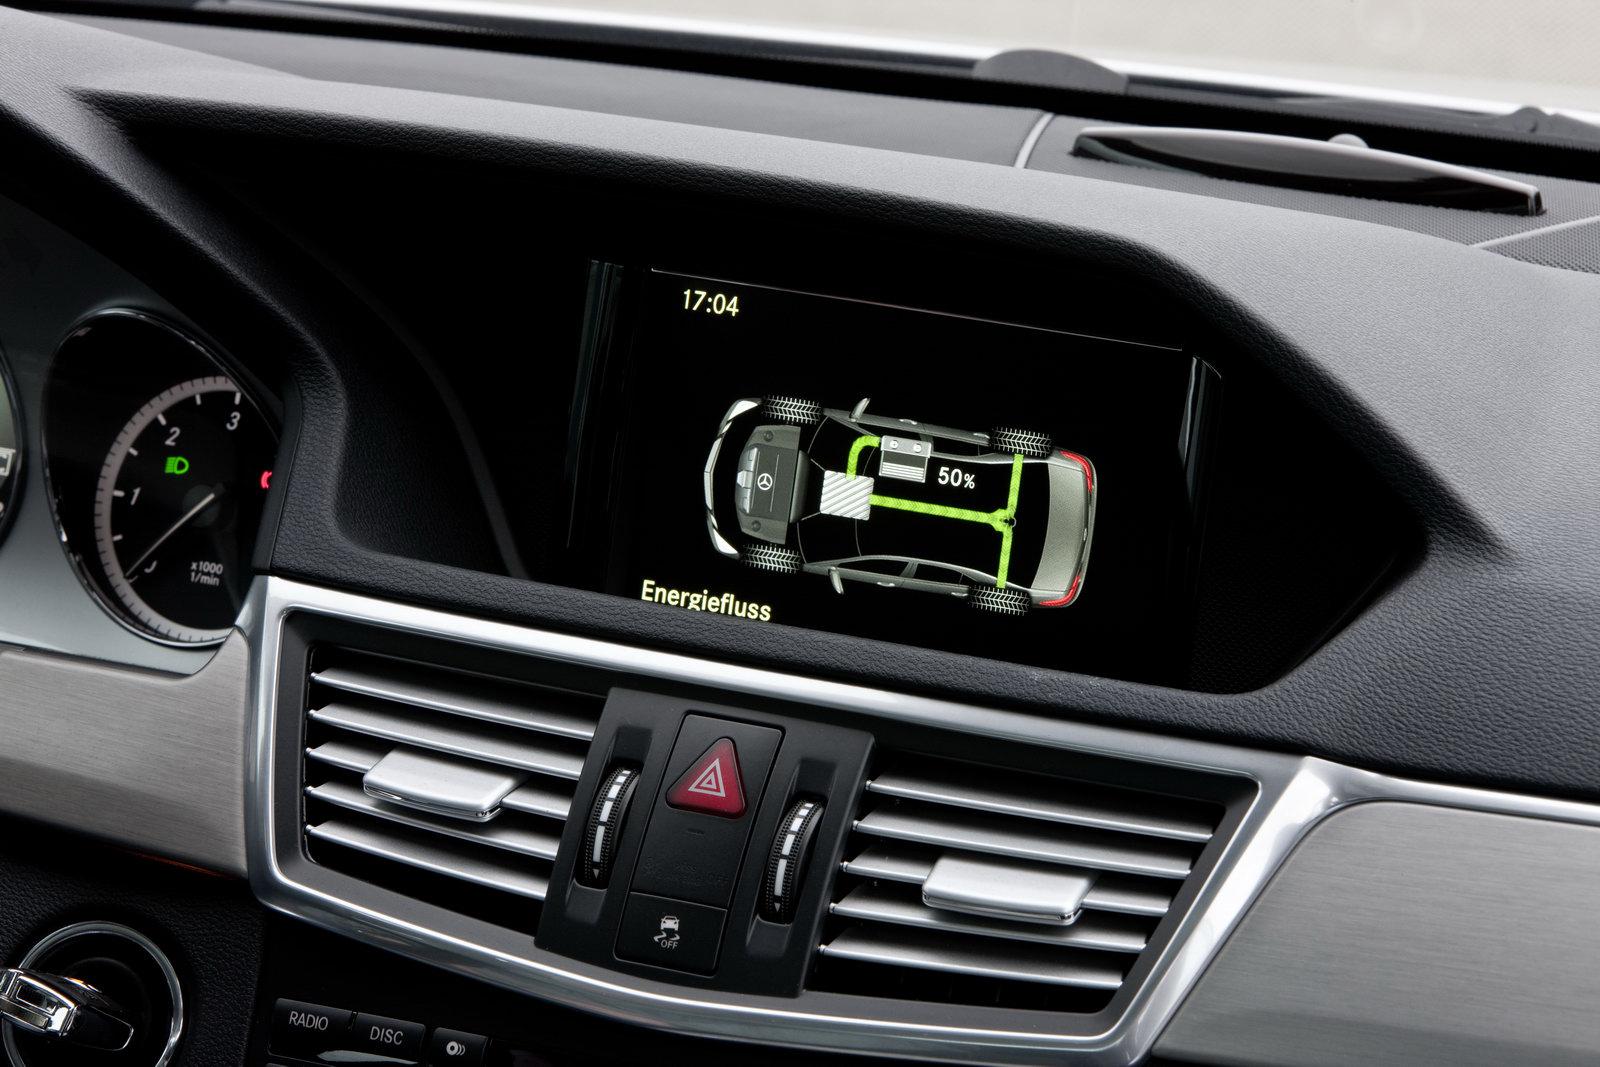 Mercedes E300 BlueTECH 2011